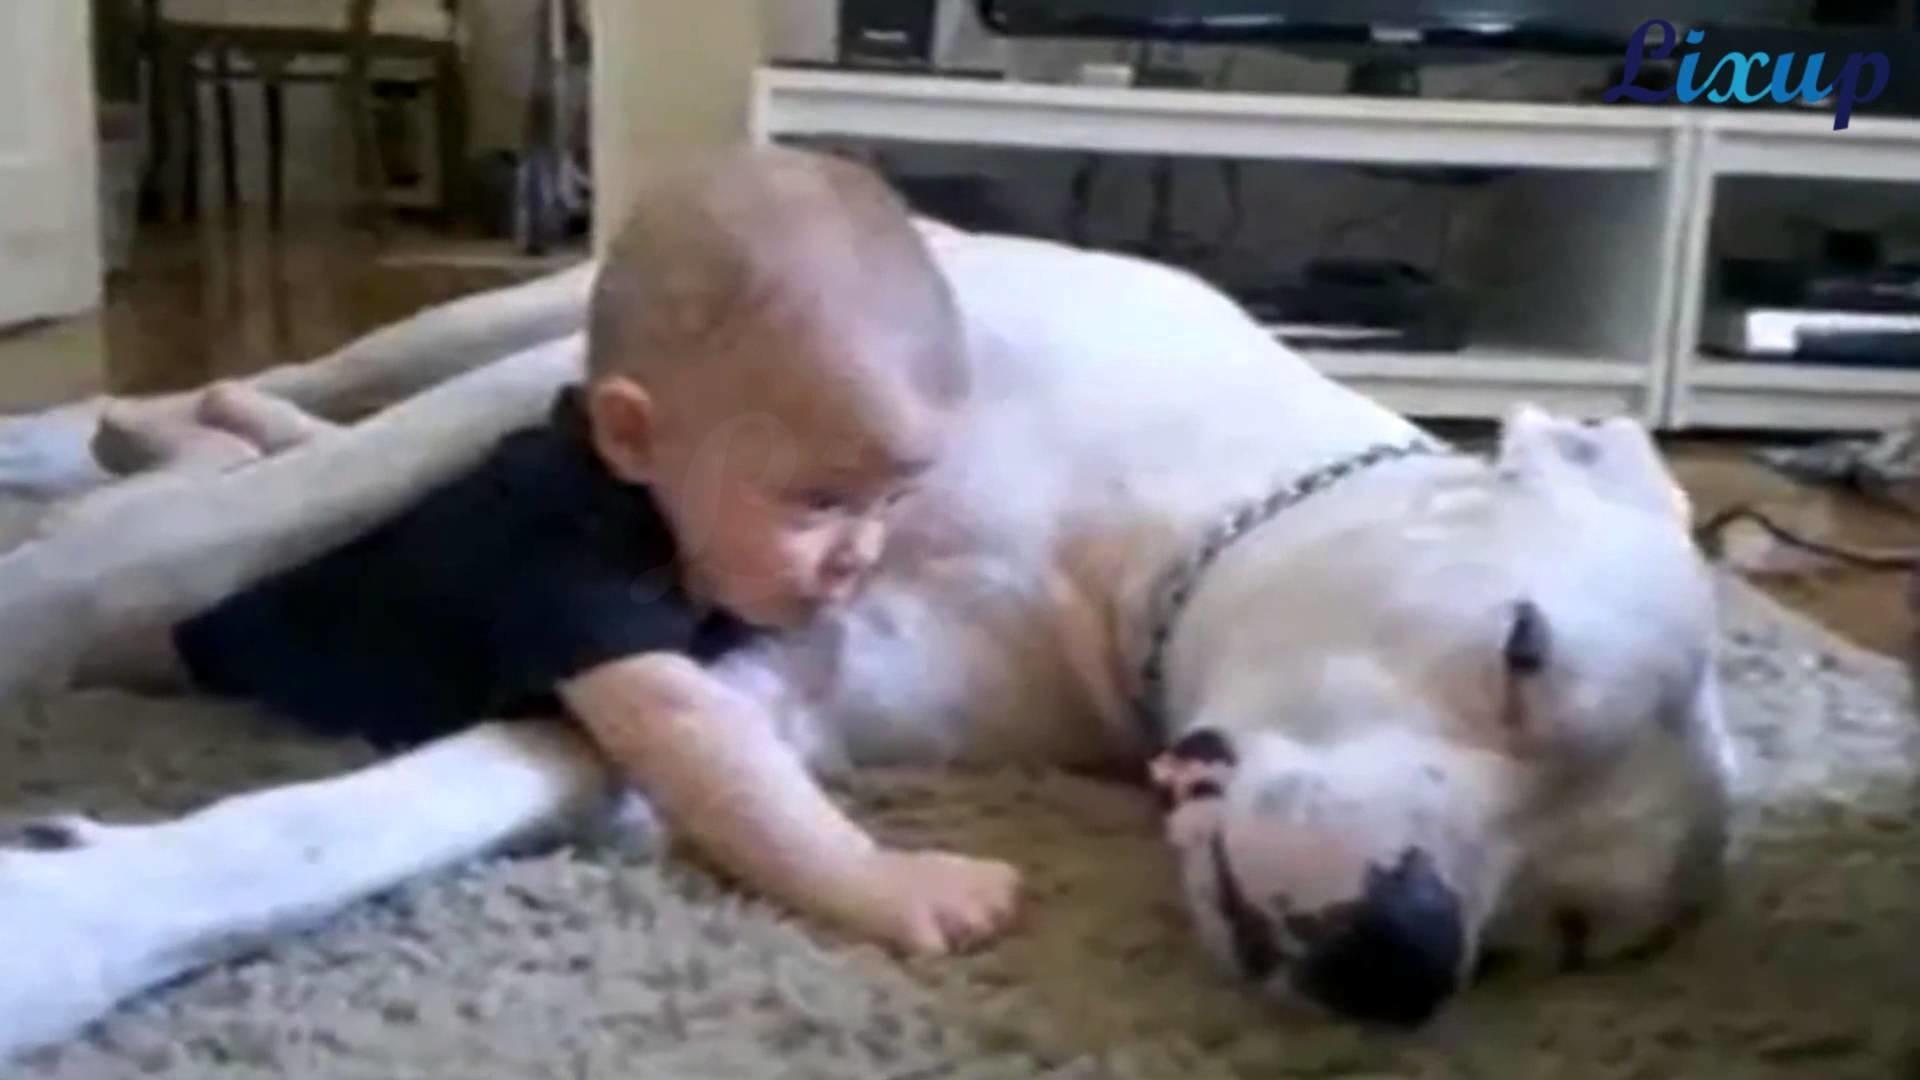 Pit bull hug and Kiss little Baby ! 斗牛拥抱和亲吻小宝宝